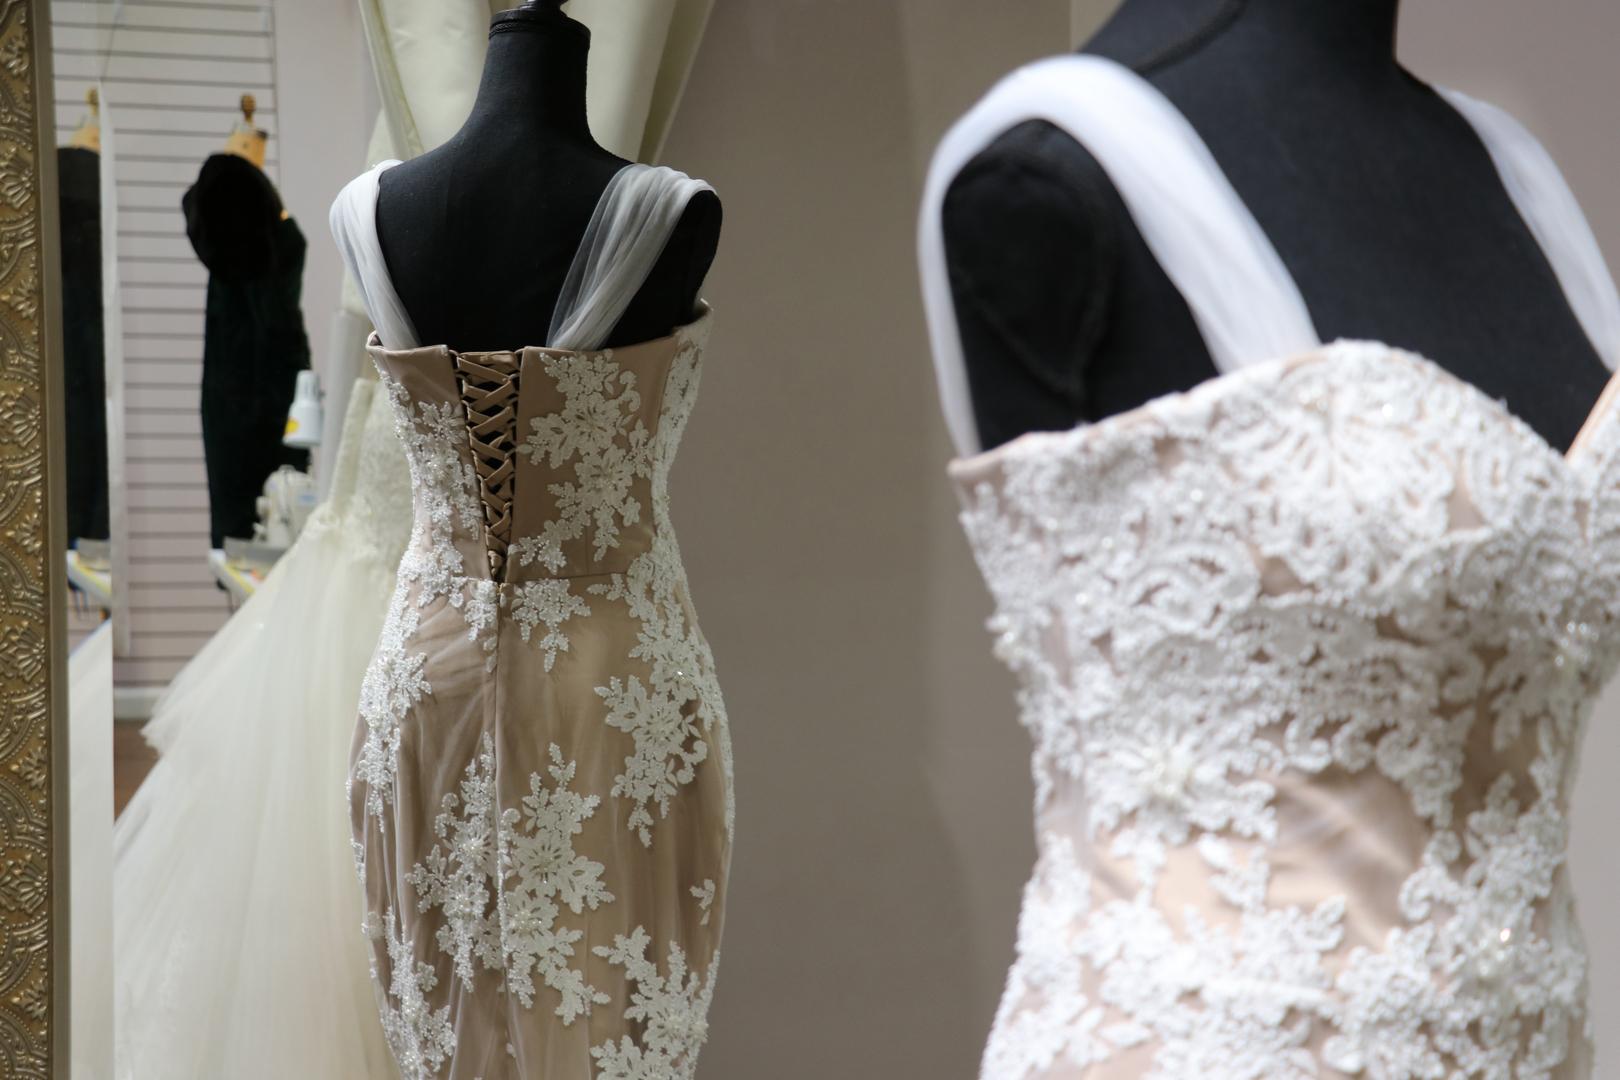 Bridesmaid Dress Alterations | Bridal Dress Alterations Prom Alterations Wedding Dress Design